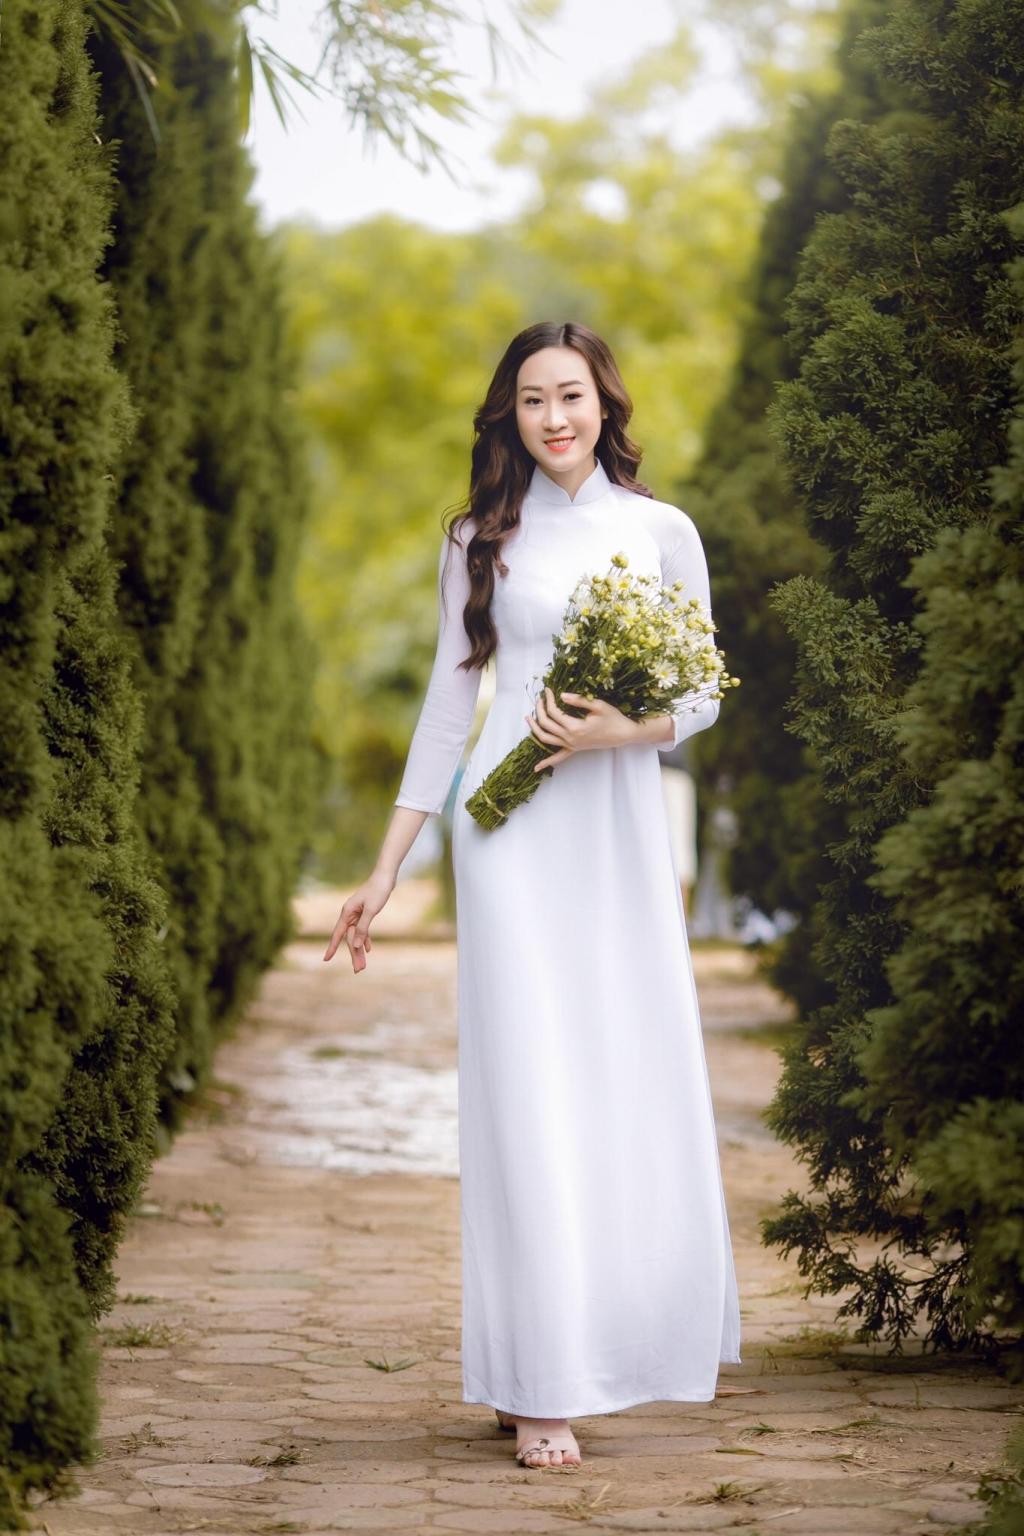 anika trinh trinh tinh khoi voi ao dai trang va cuc hoa mi